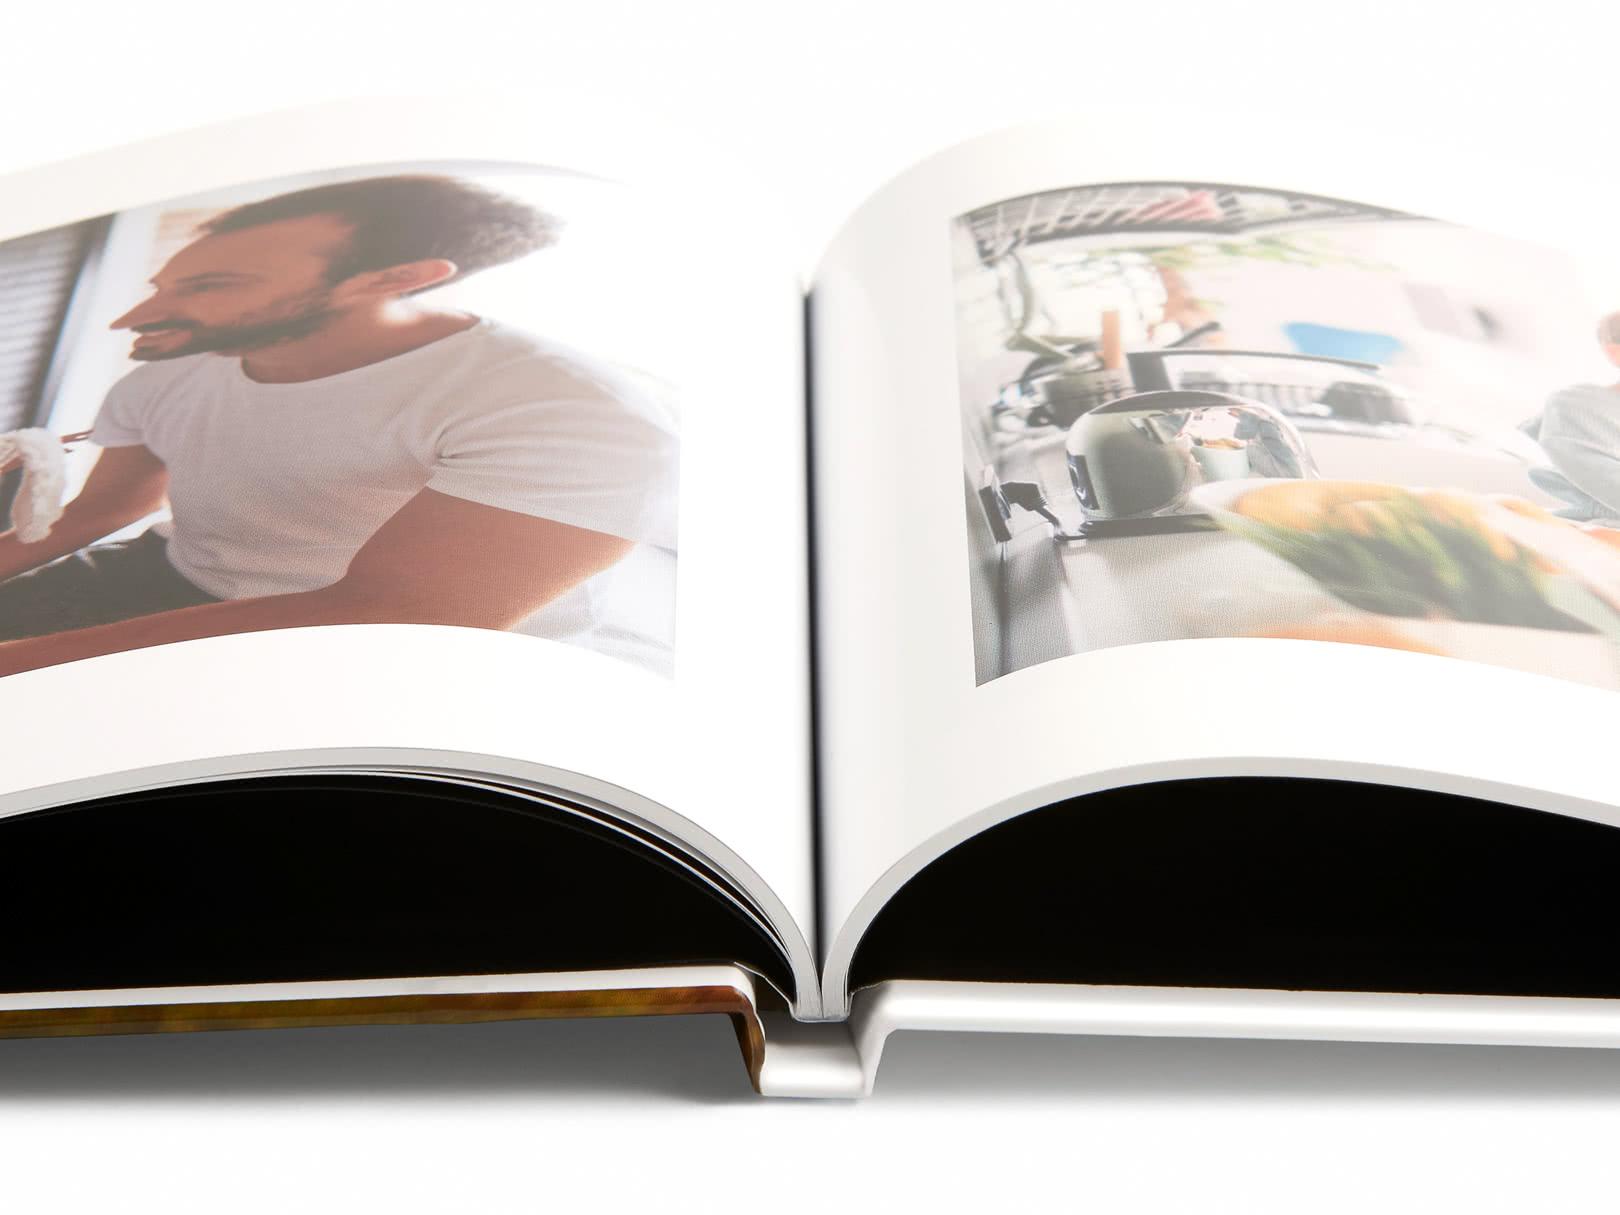 Fotobuch-Cover